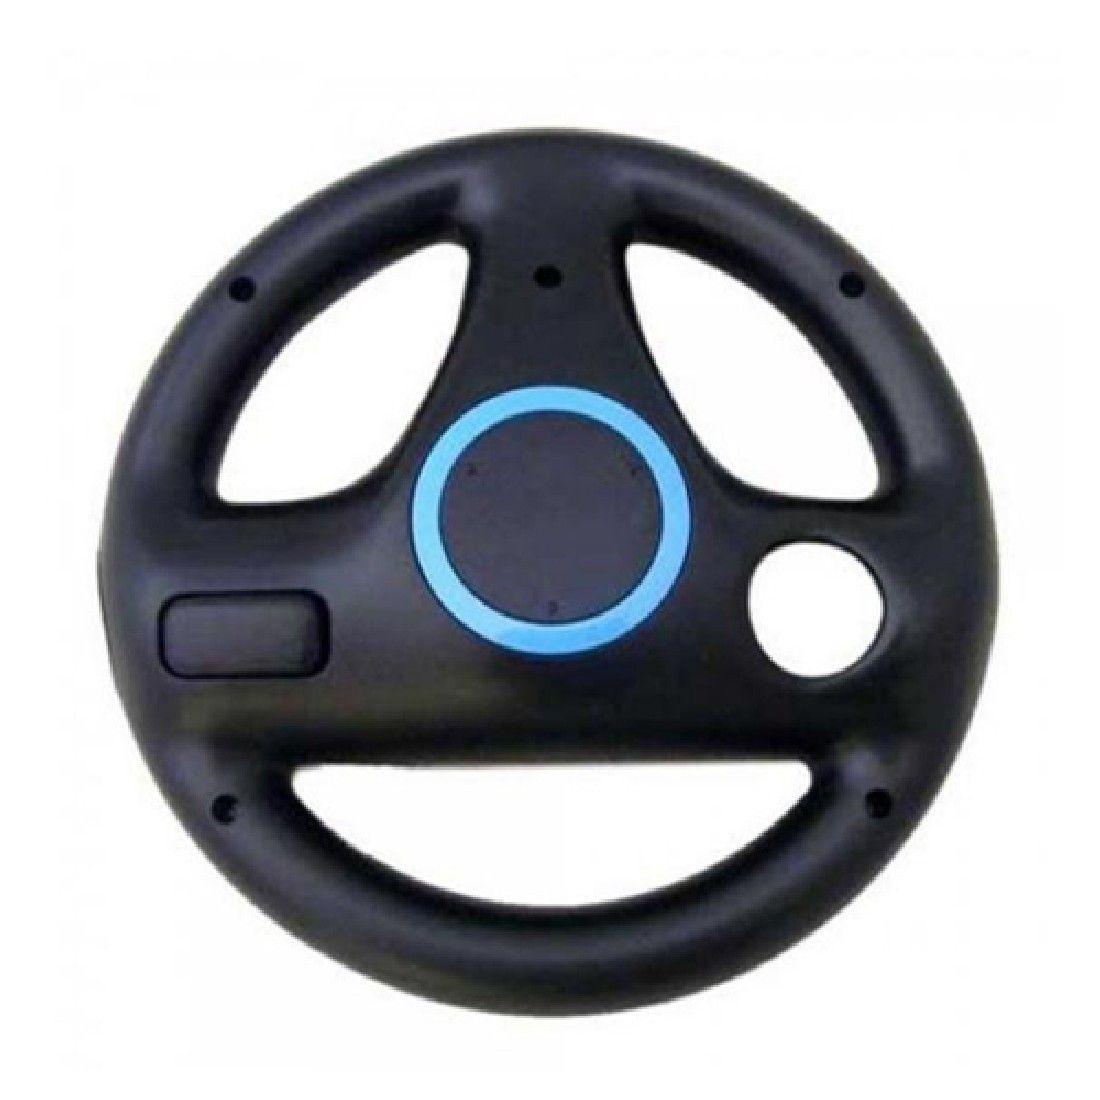 Hot Sale Black Steering Wheel For Nintendo Wii Mario Kart Racing Top Quality Games Remote Controller